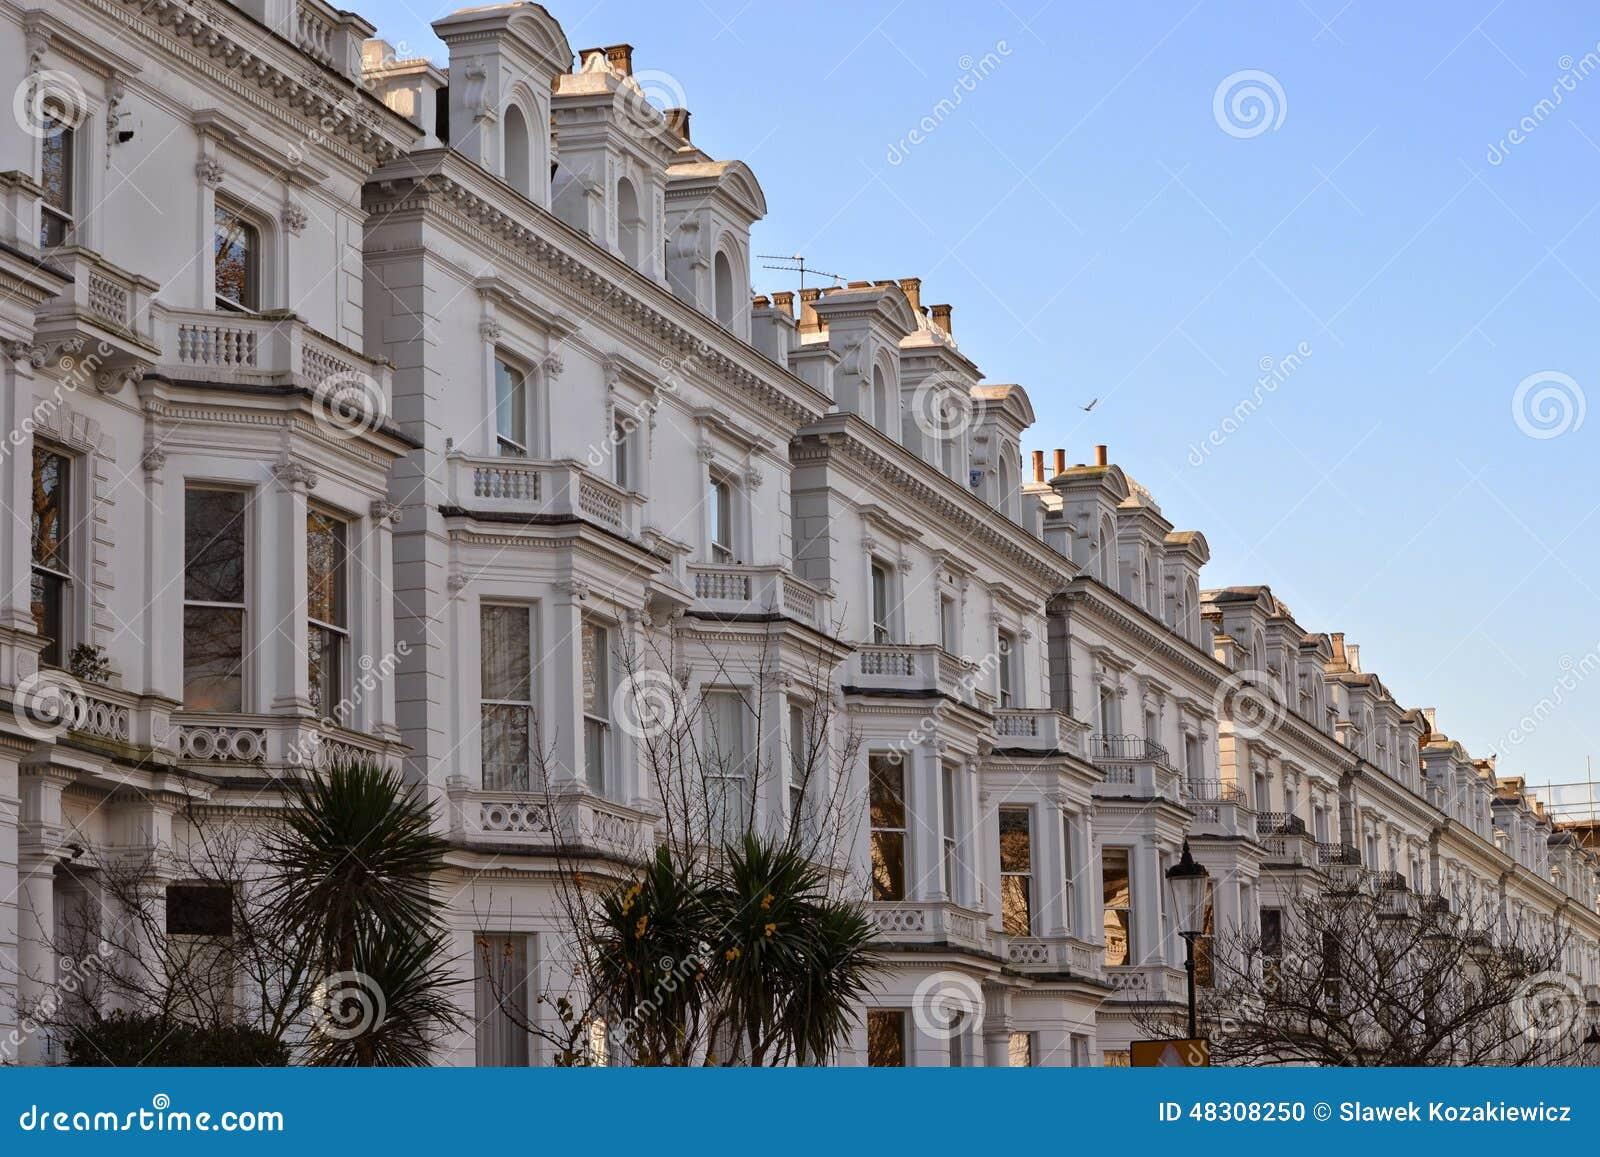 gehobene h user notting hill london stockfoto bild 48308250. Black Bedroom Furniture Sets. Home Design Ideas